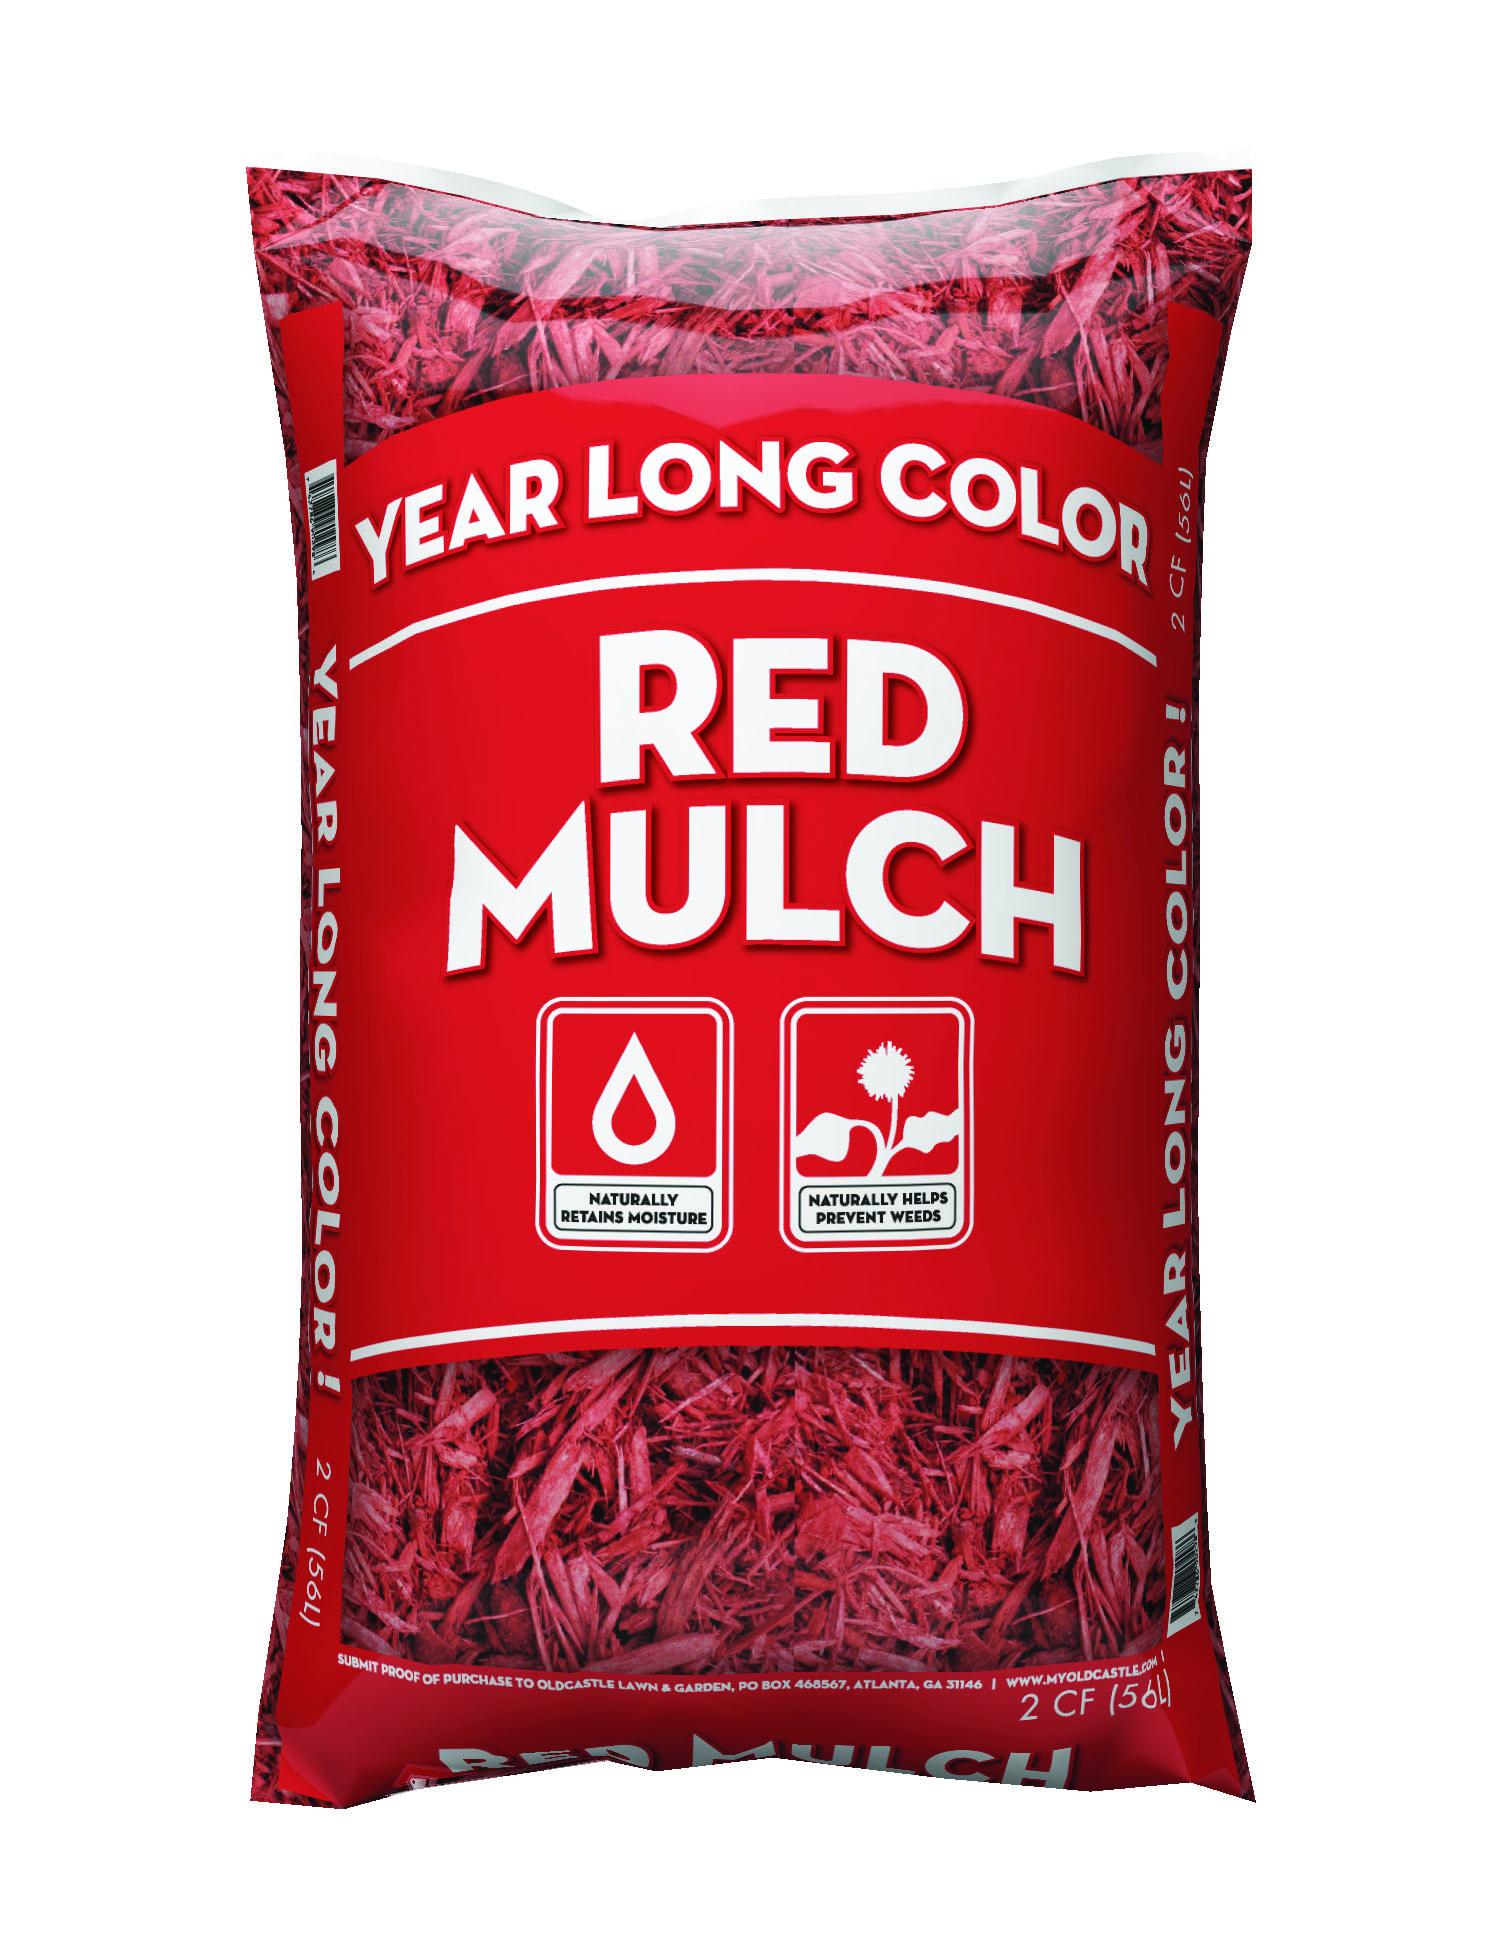 2CF Year Long Red Mulch Walmart in store YMMV - $1